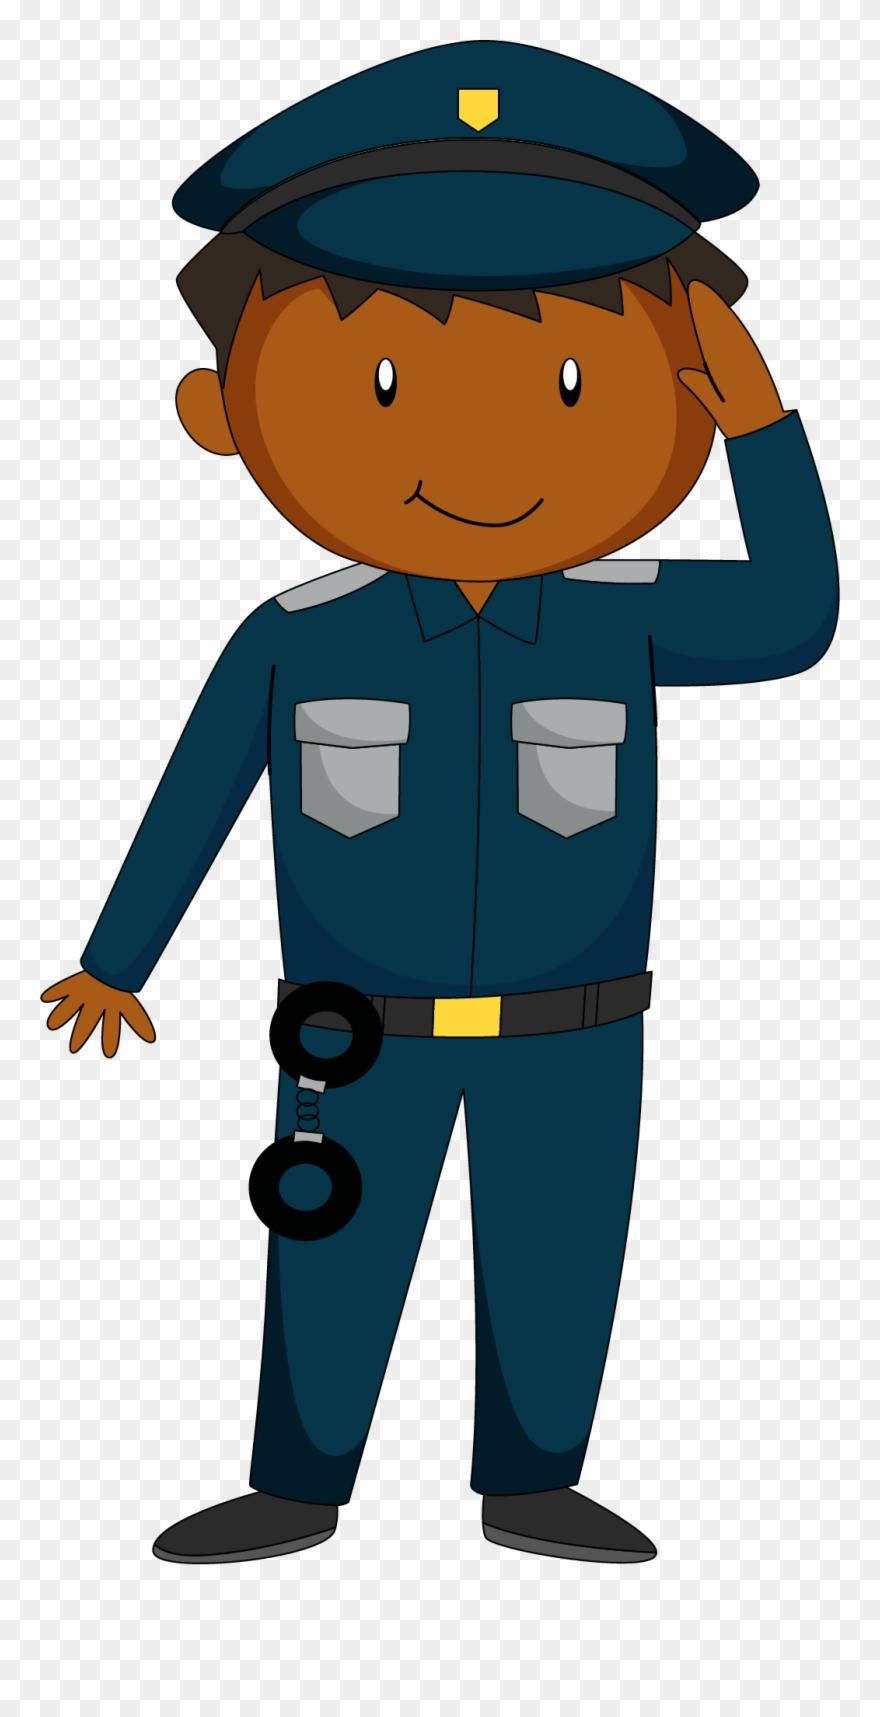 police-officer # 4854397